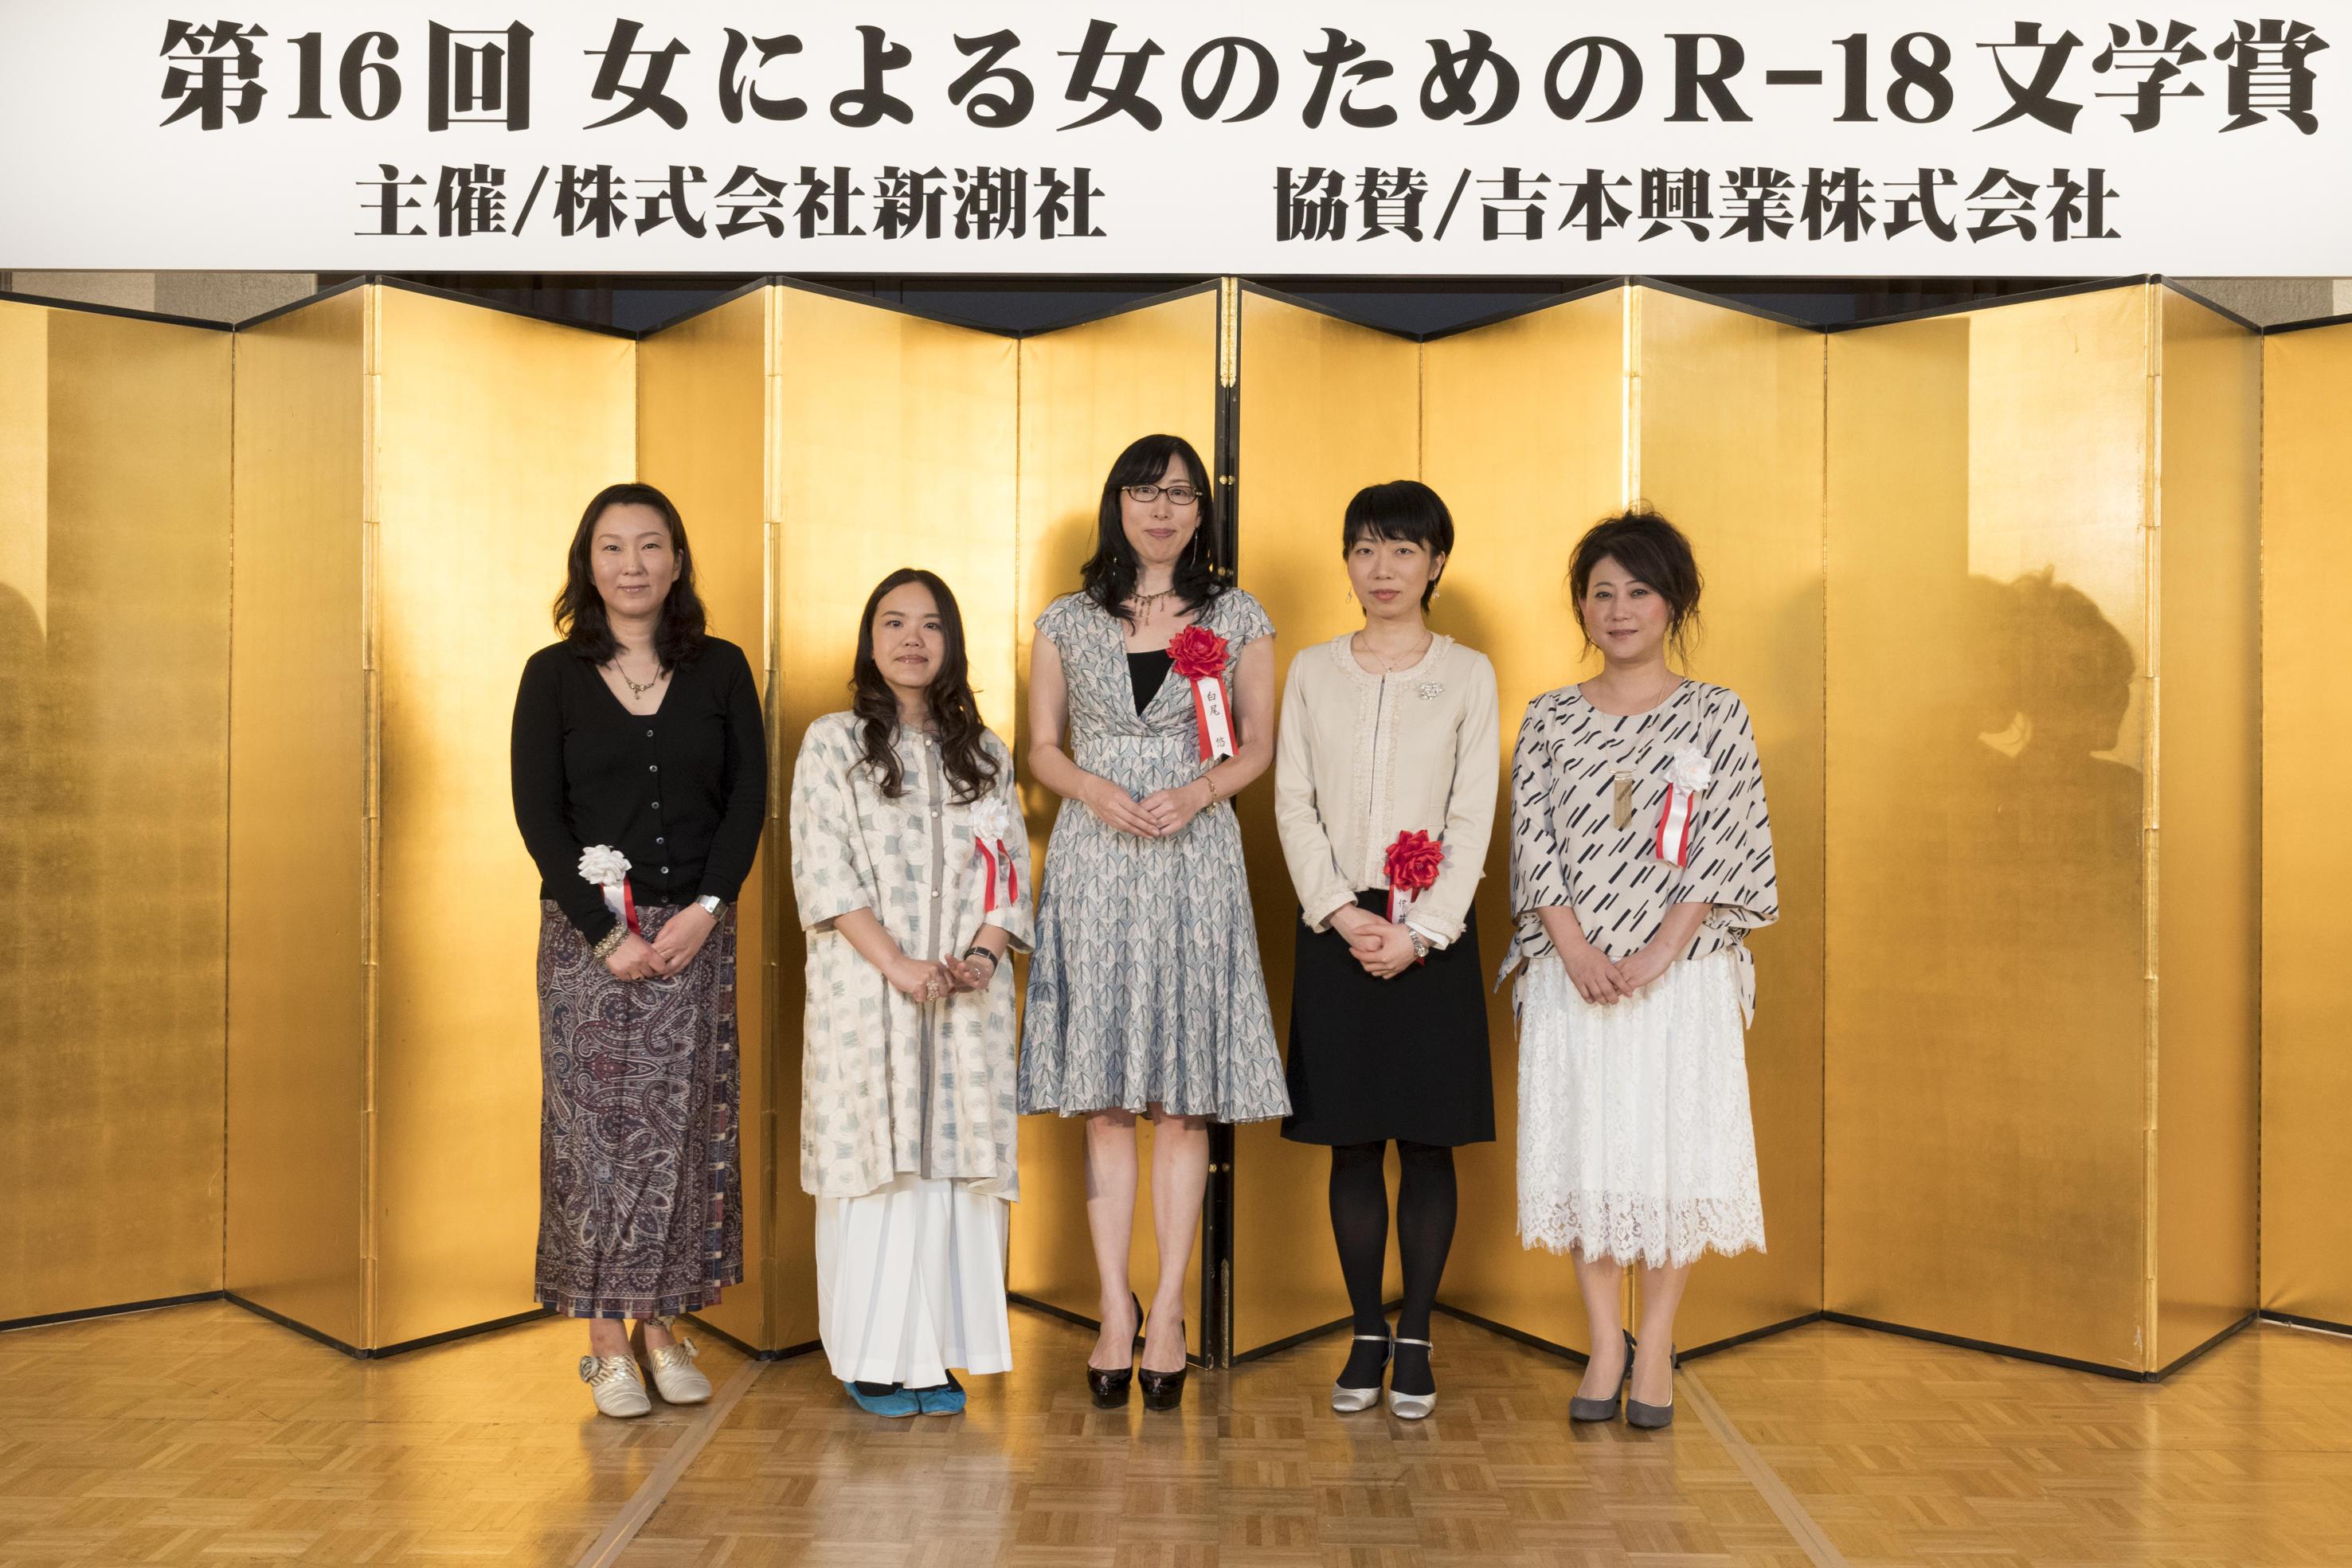 http://news.yoshimoto.co.jp/20170428111839-8cdff118f02c421db3dd0dbf4d7e5d1b91c5e8e3.jpg